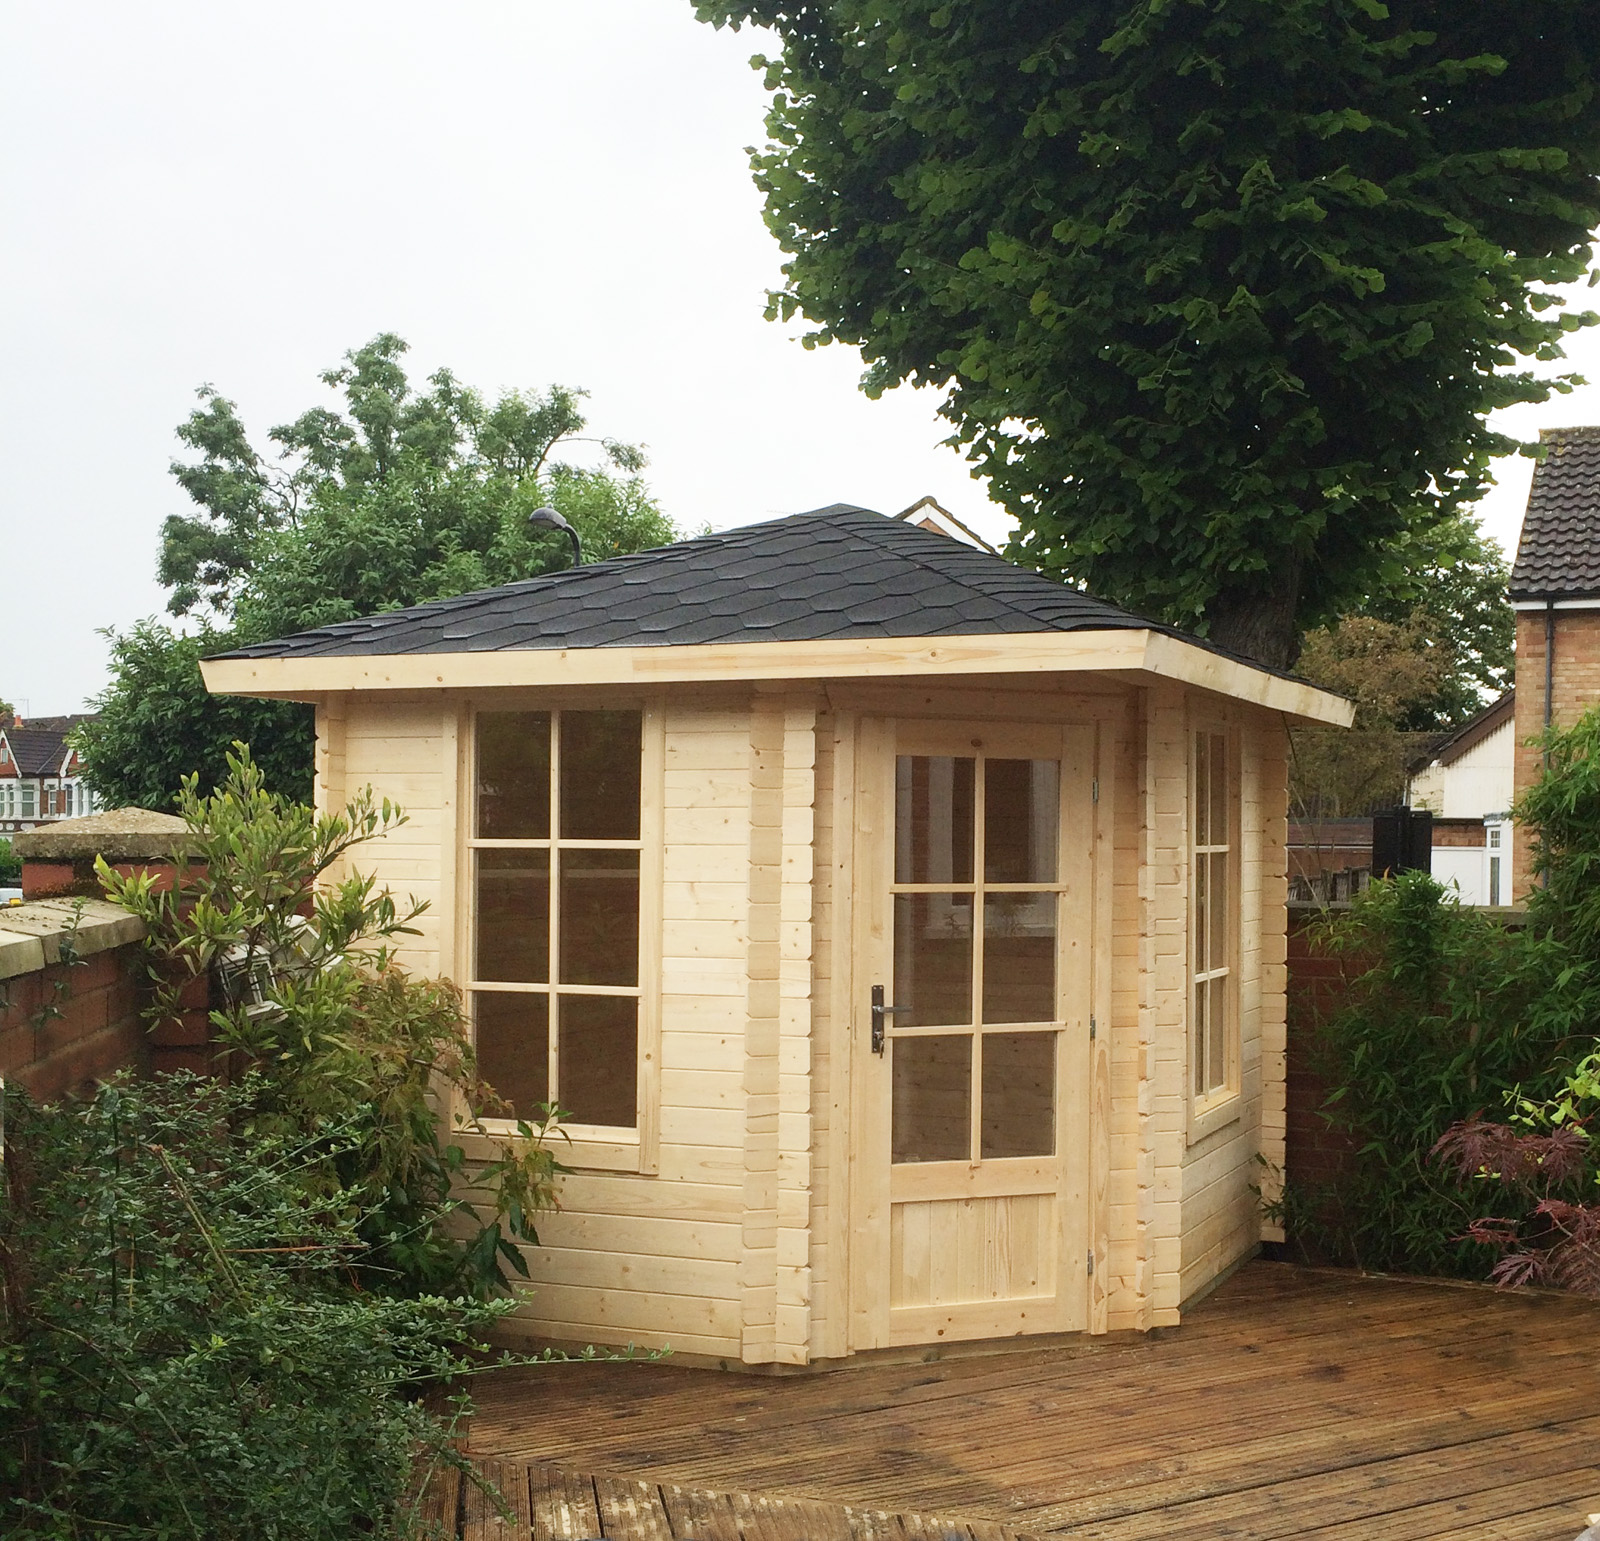 gartenh user eck gartenhaus 5 eck 403921 260x260cm 40mm. Black Bedroom Furniture Sets. Home Design Ideas